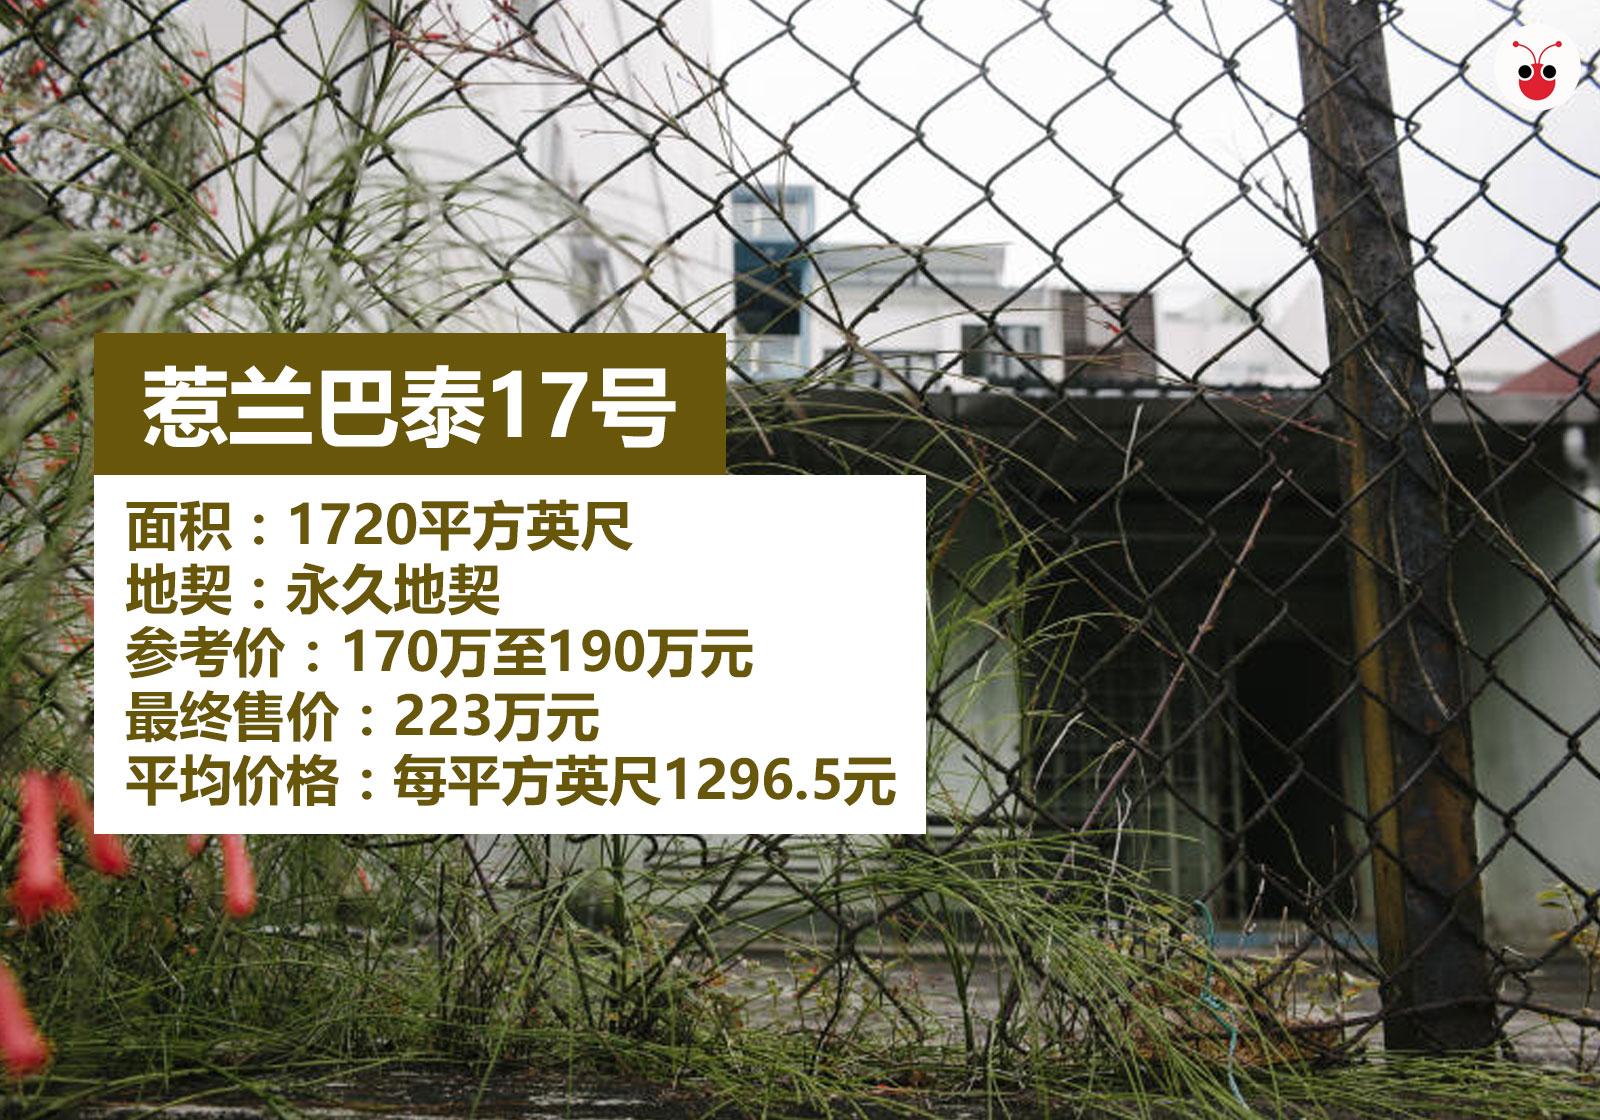 20180228_address.jpg